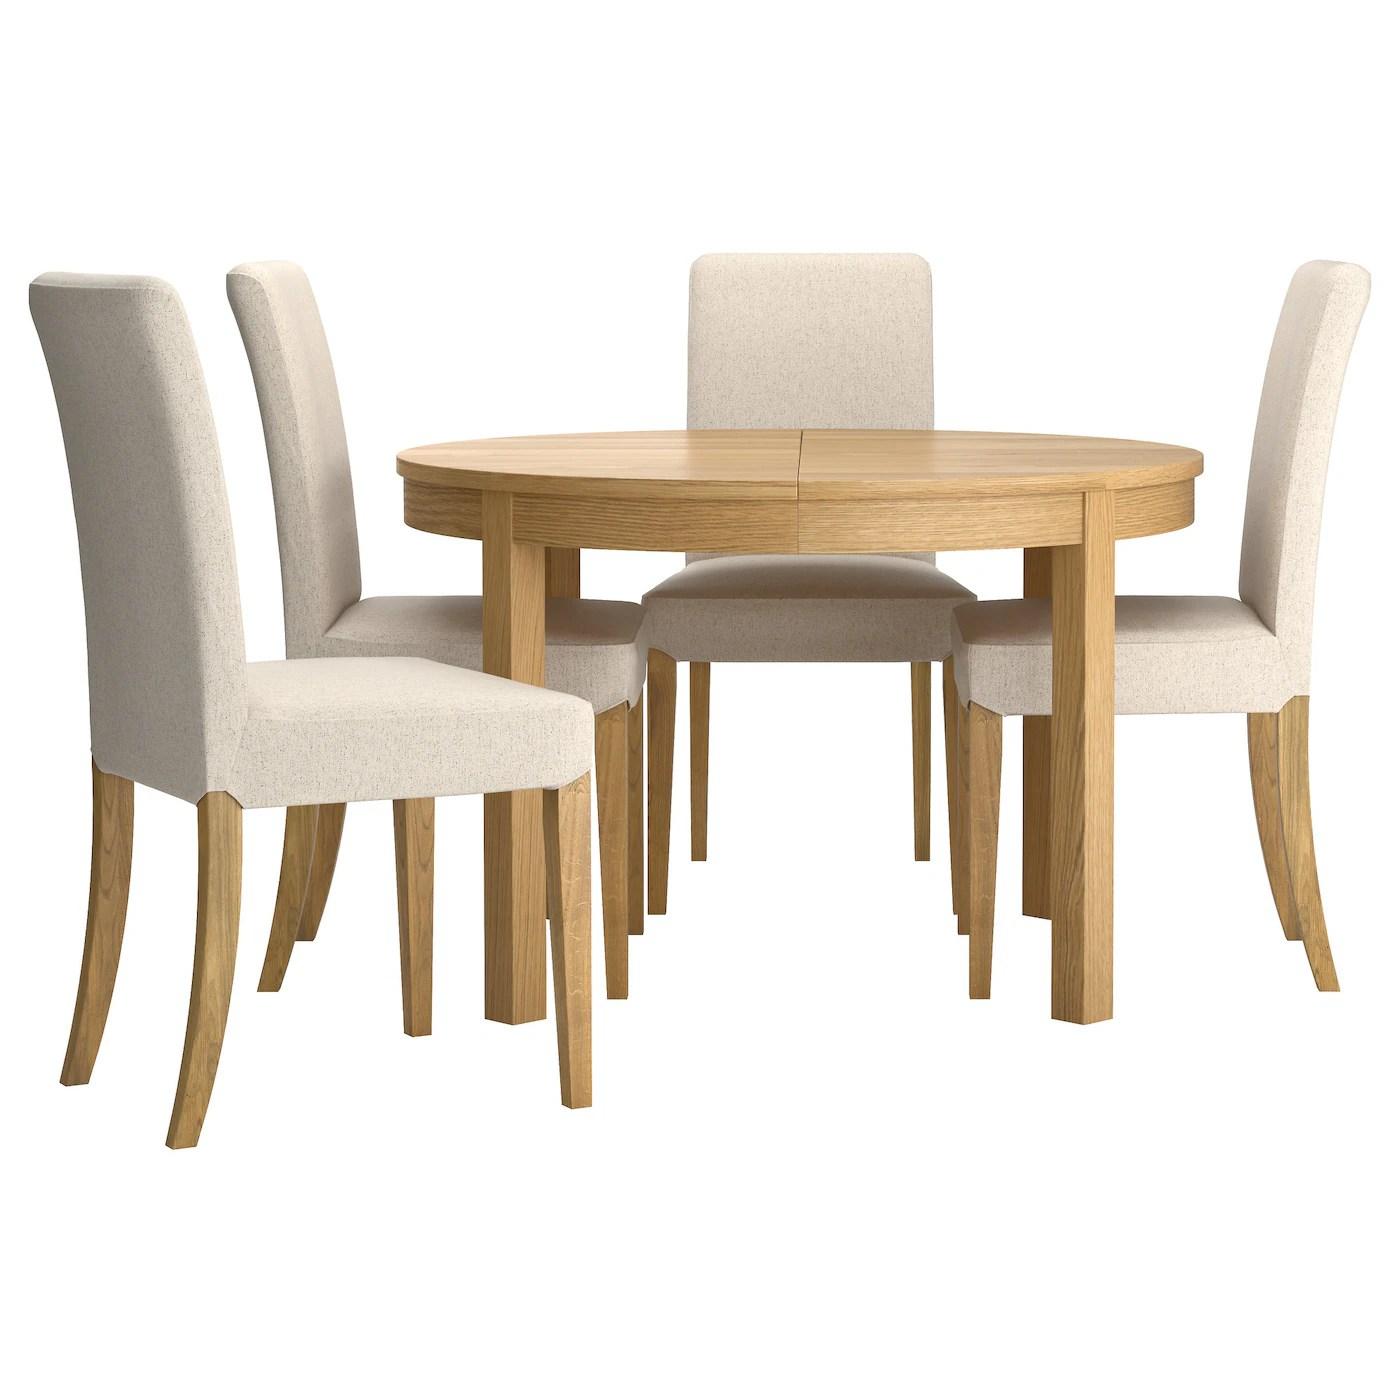 ikea small table and chairs baby lawn chair henriksdal bjursta 4 oak veneer linneryd